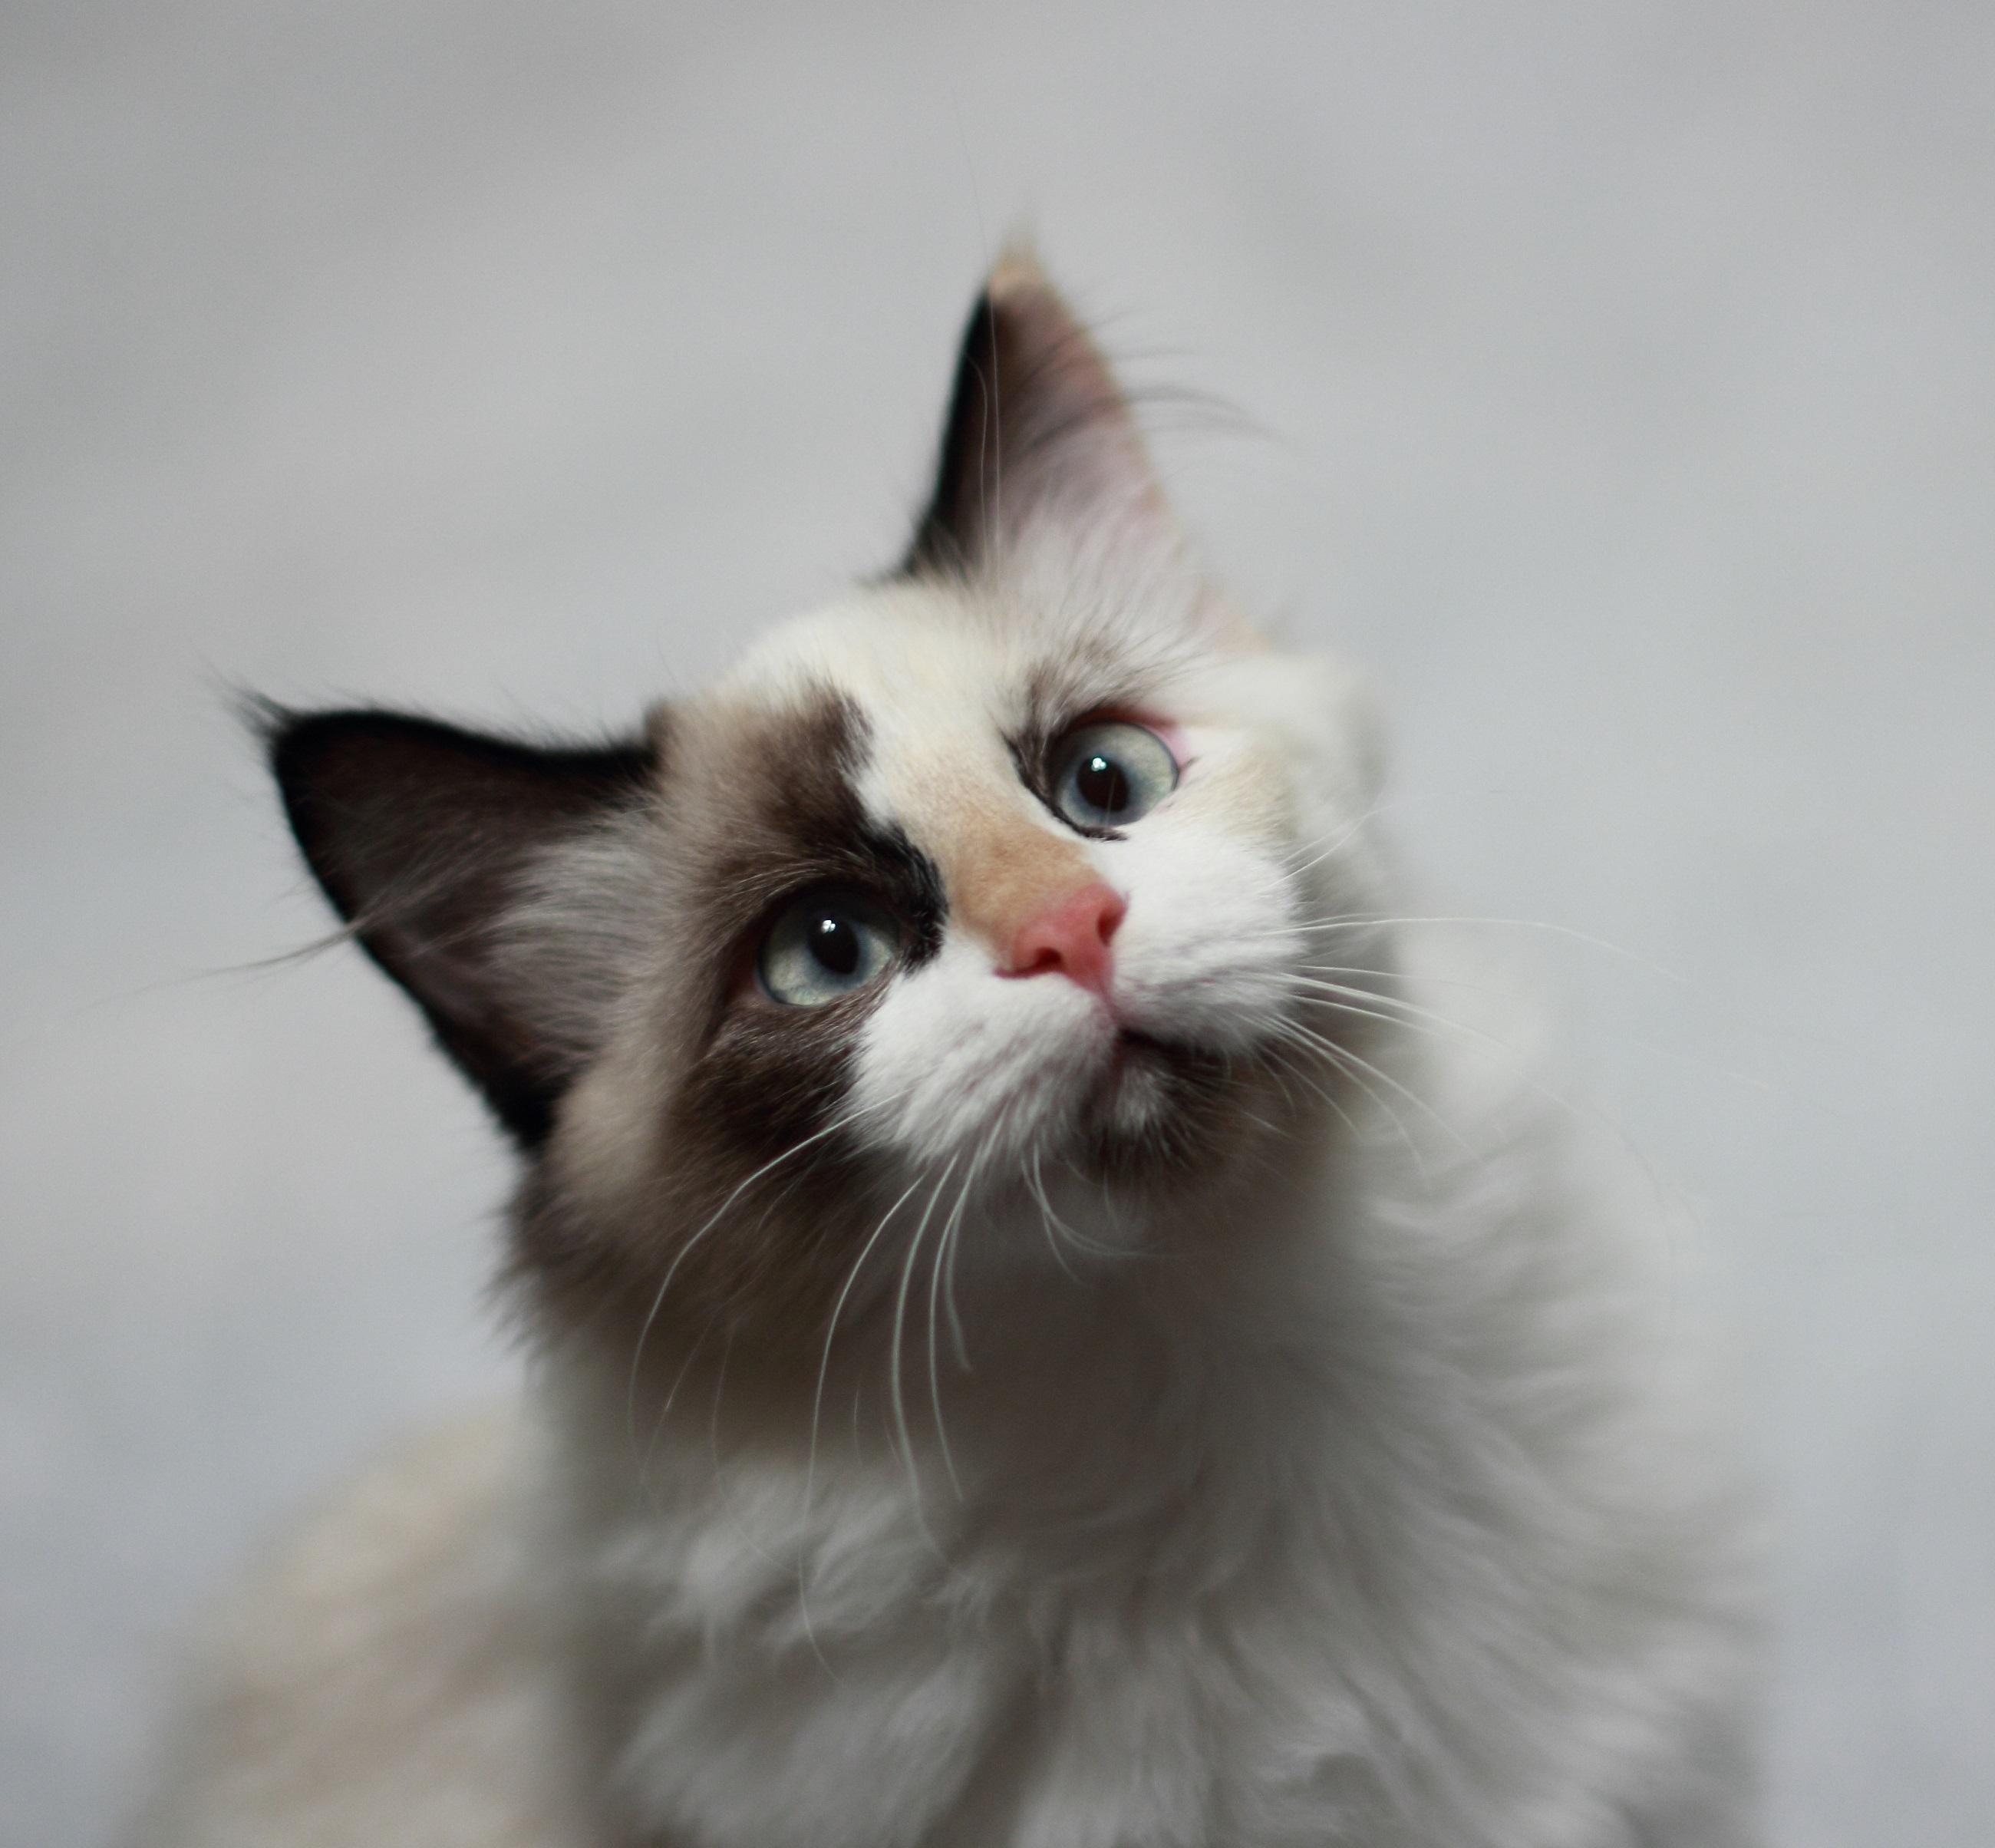 Free Images Cute Looking Fur Portrait Kitten Sitting